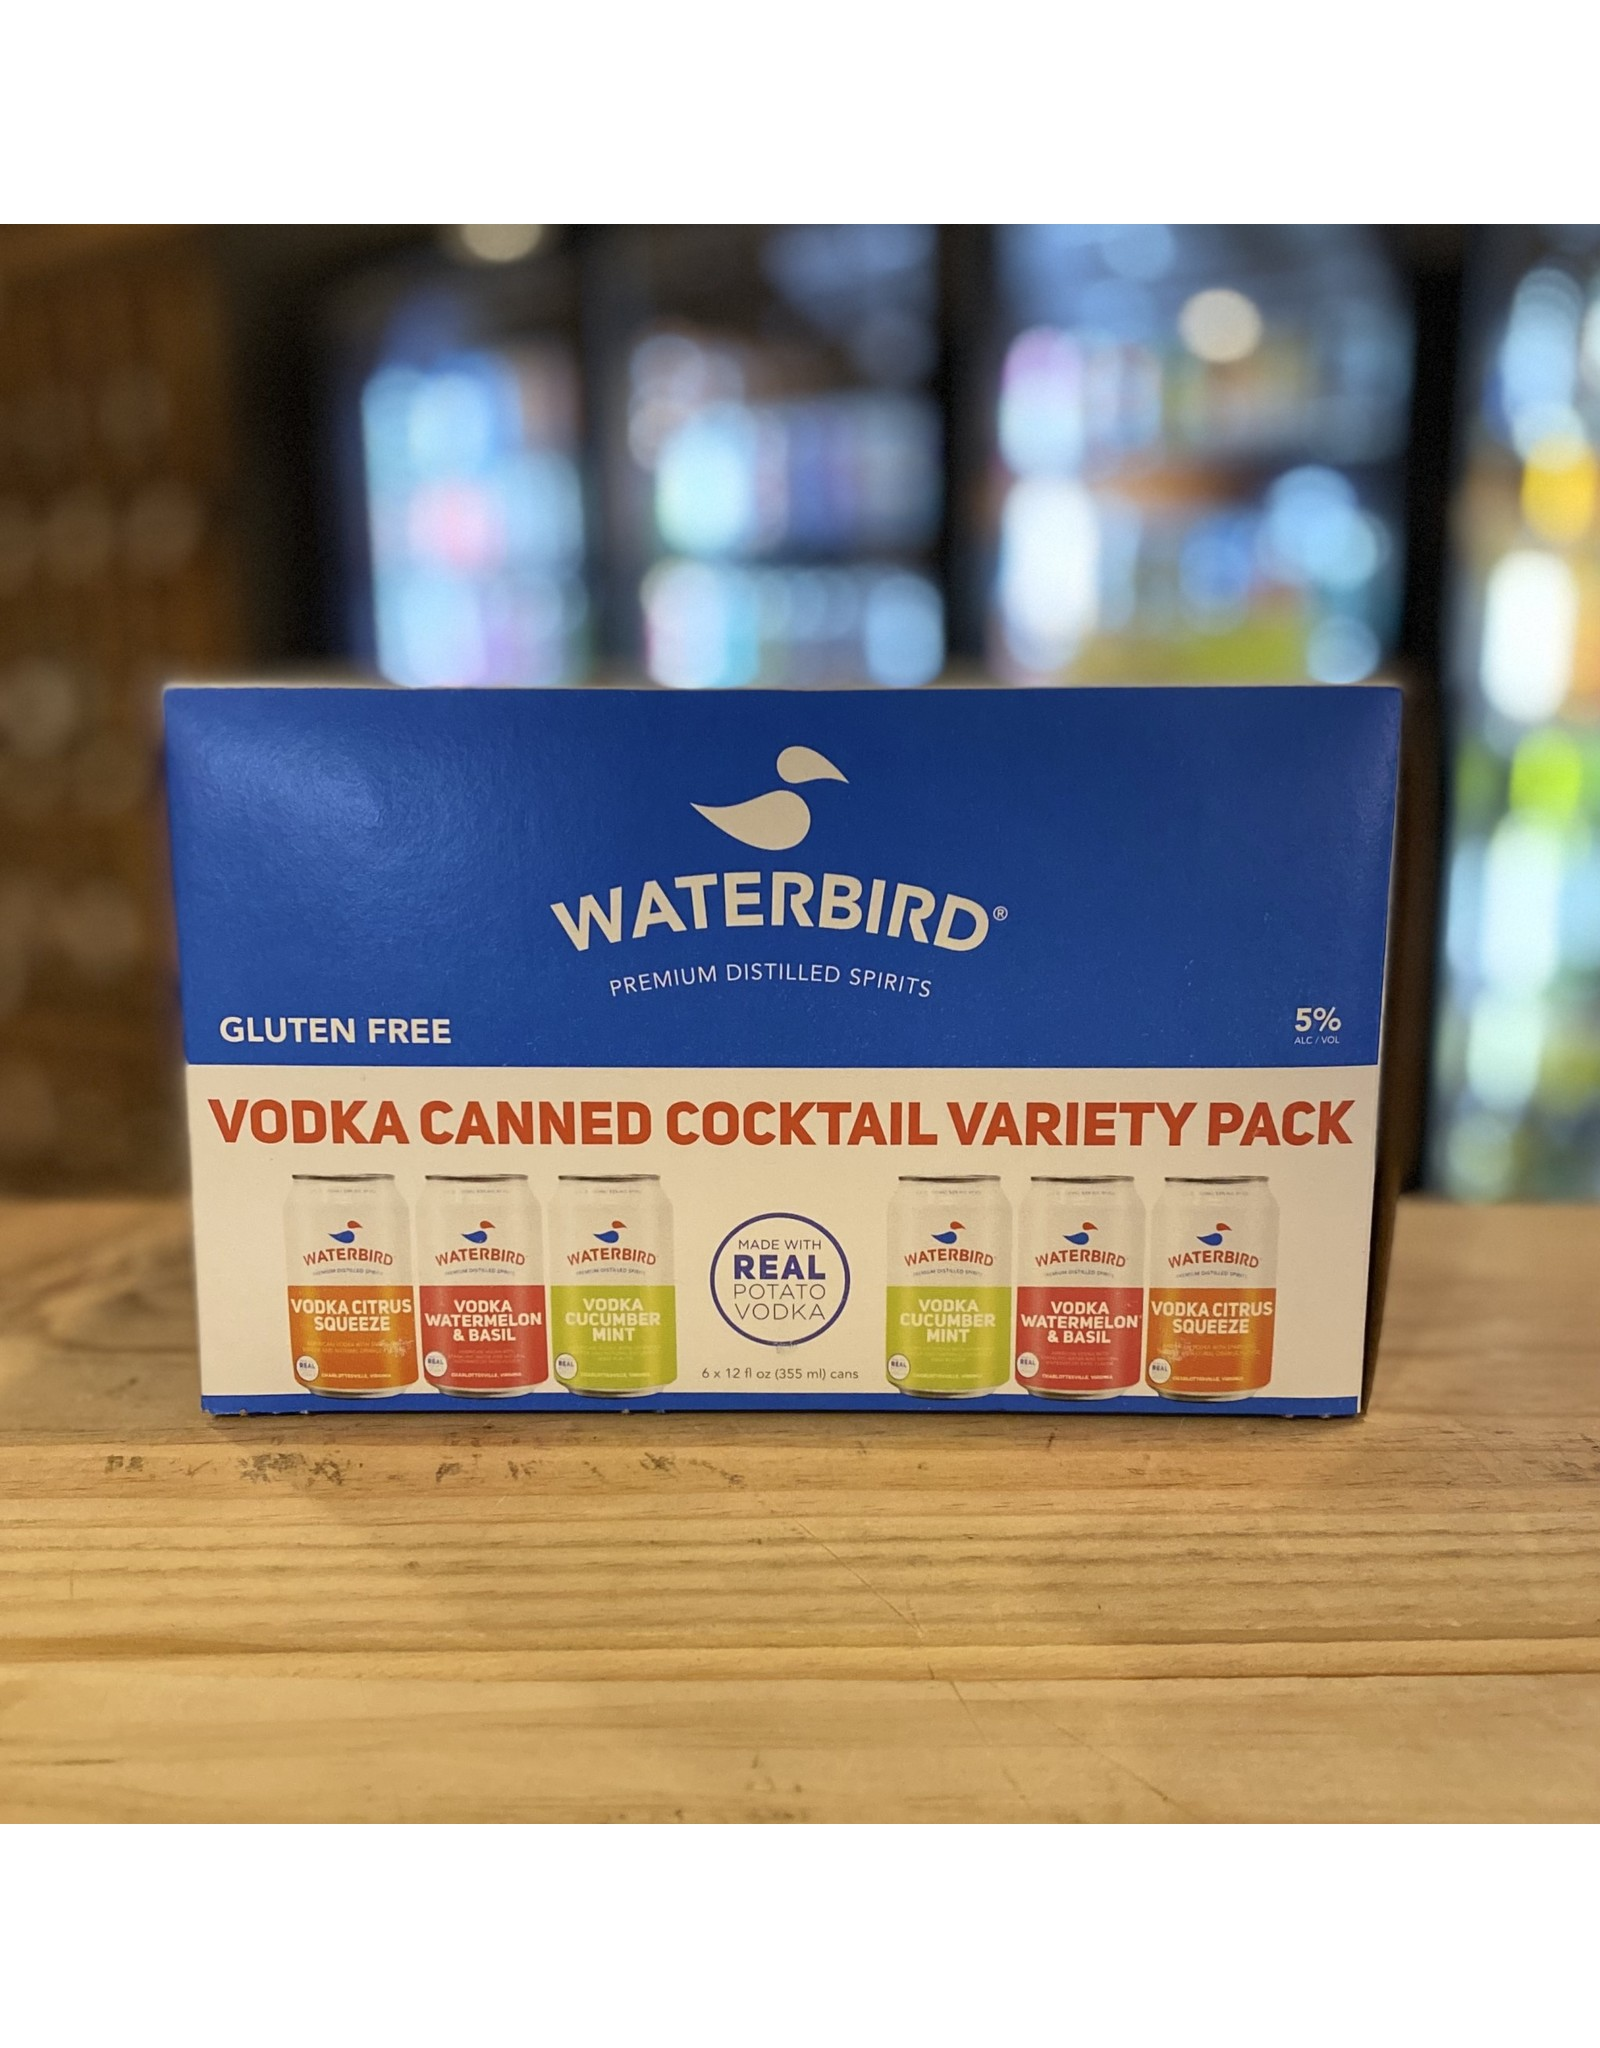 Waterbird Vodka RTD Canned Cocktail Variety Pack - Charlottsville, VA